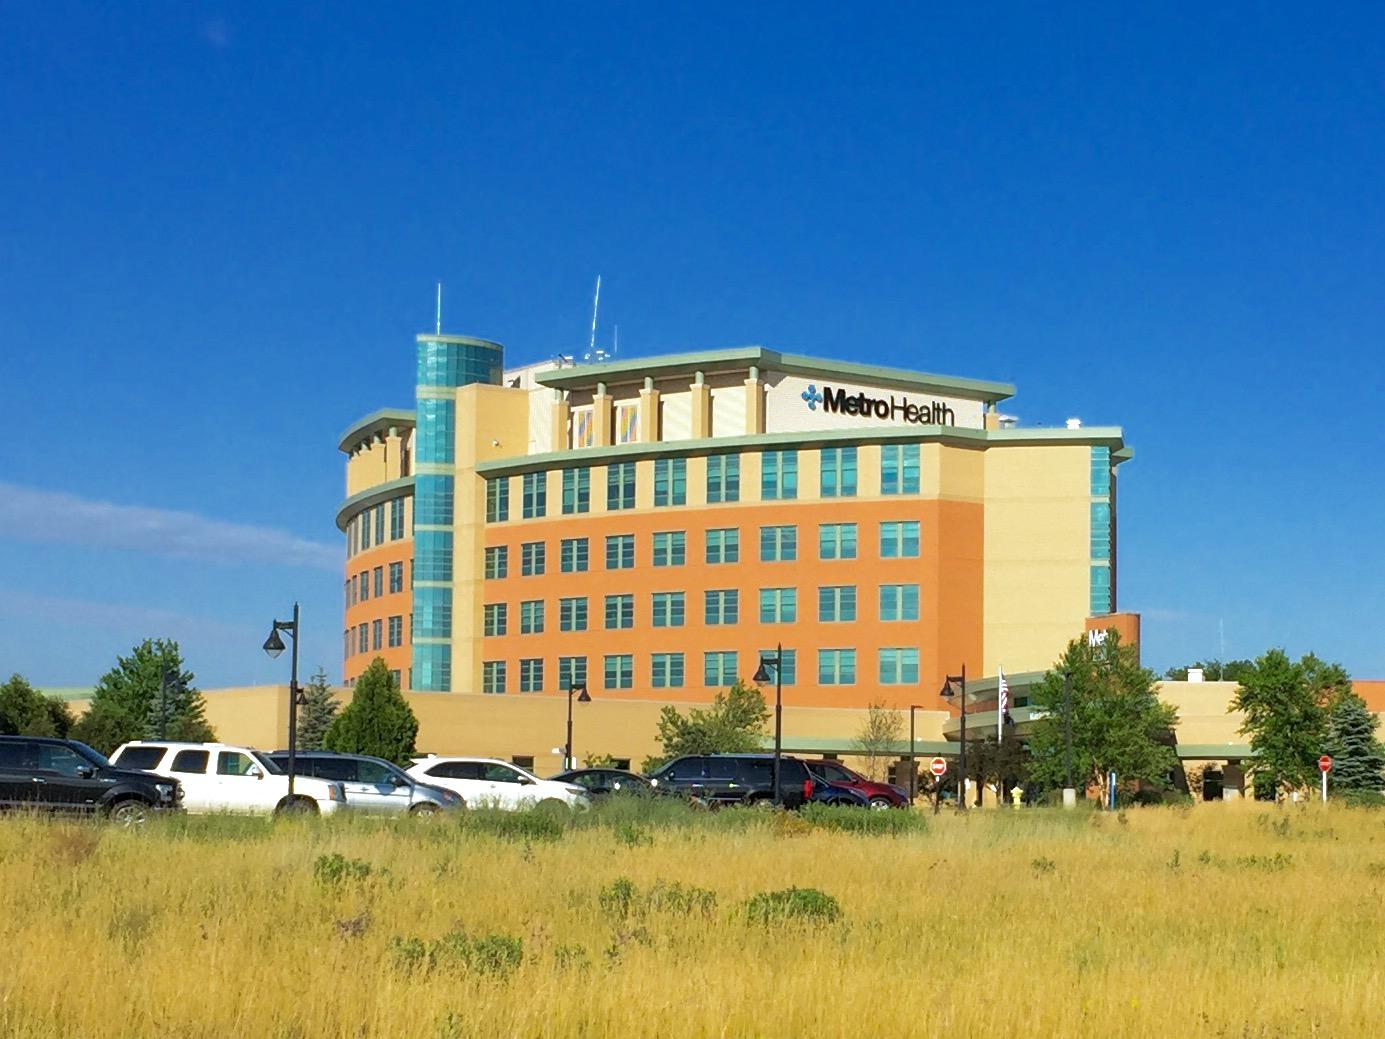 Metro Health Hospital - Wikipedia